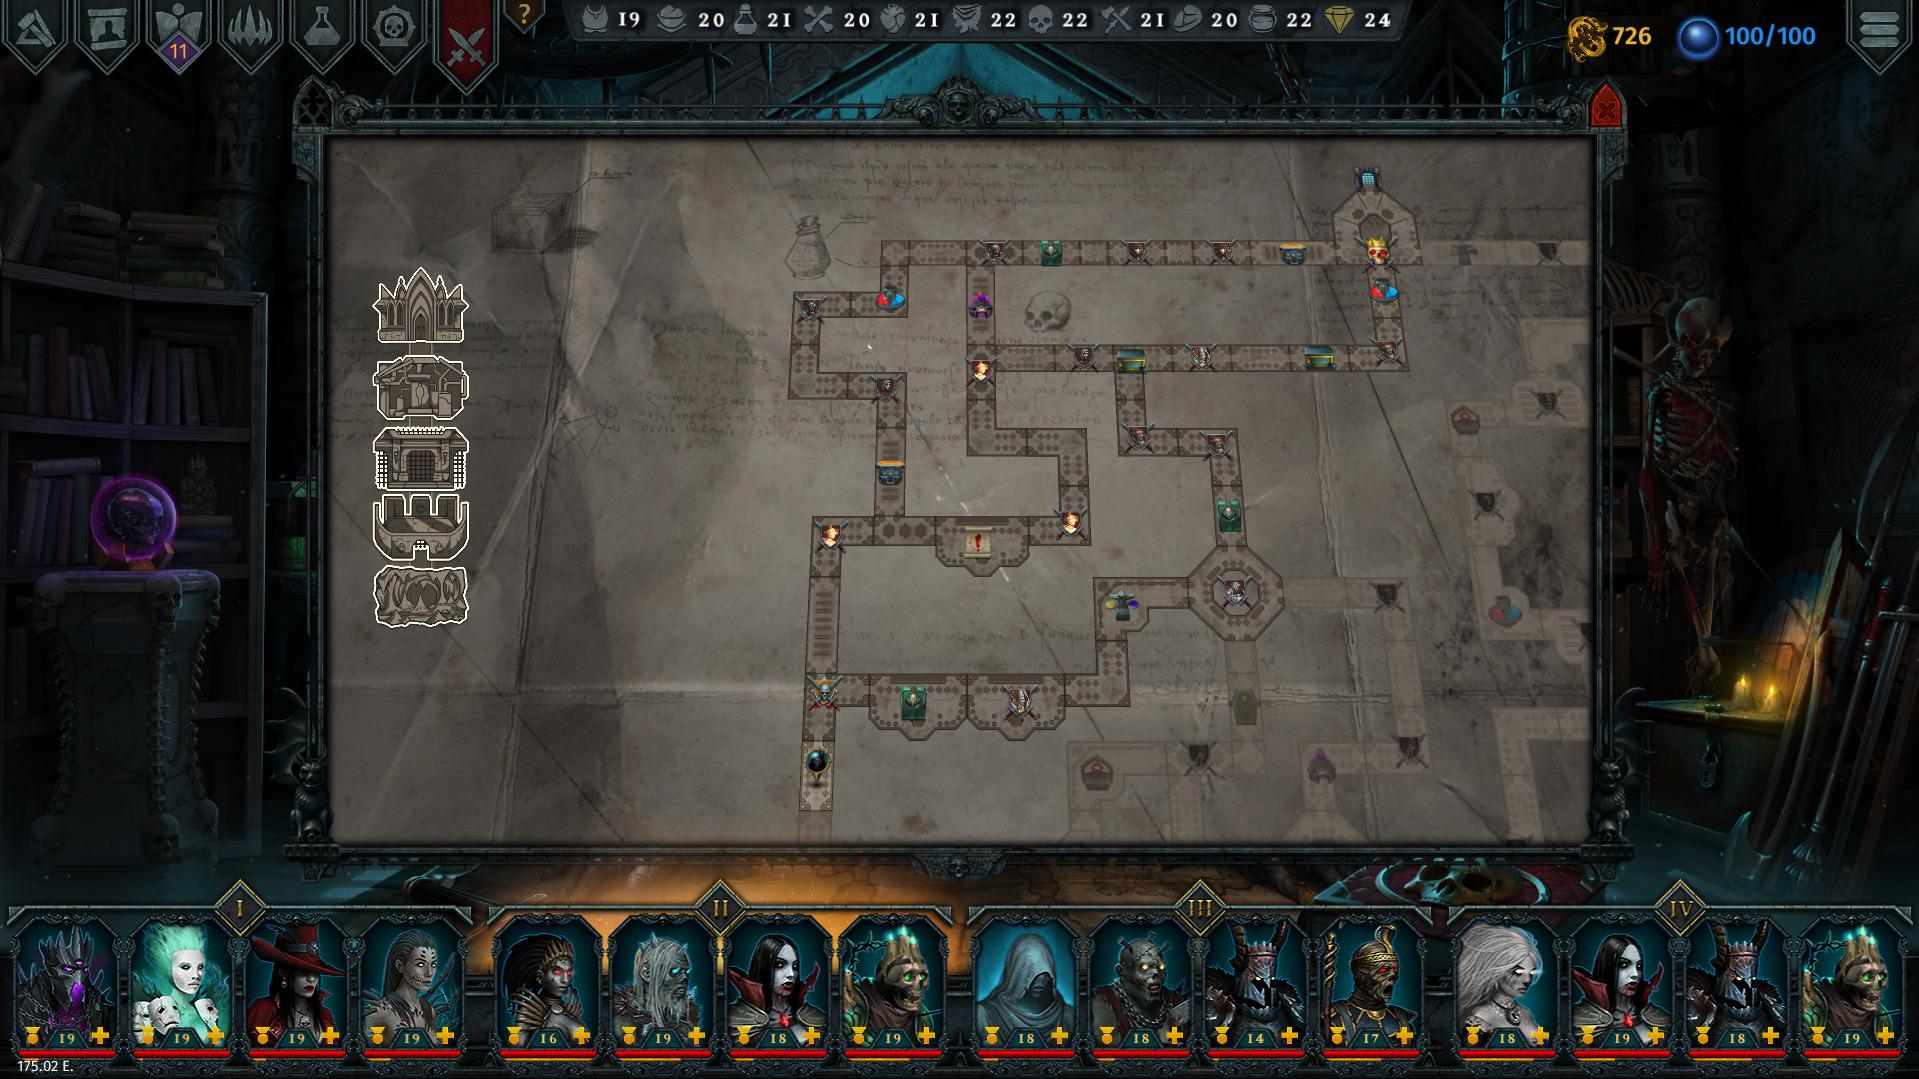 iratus-necromancer-edition-pc-screenshot-02